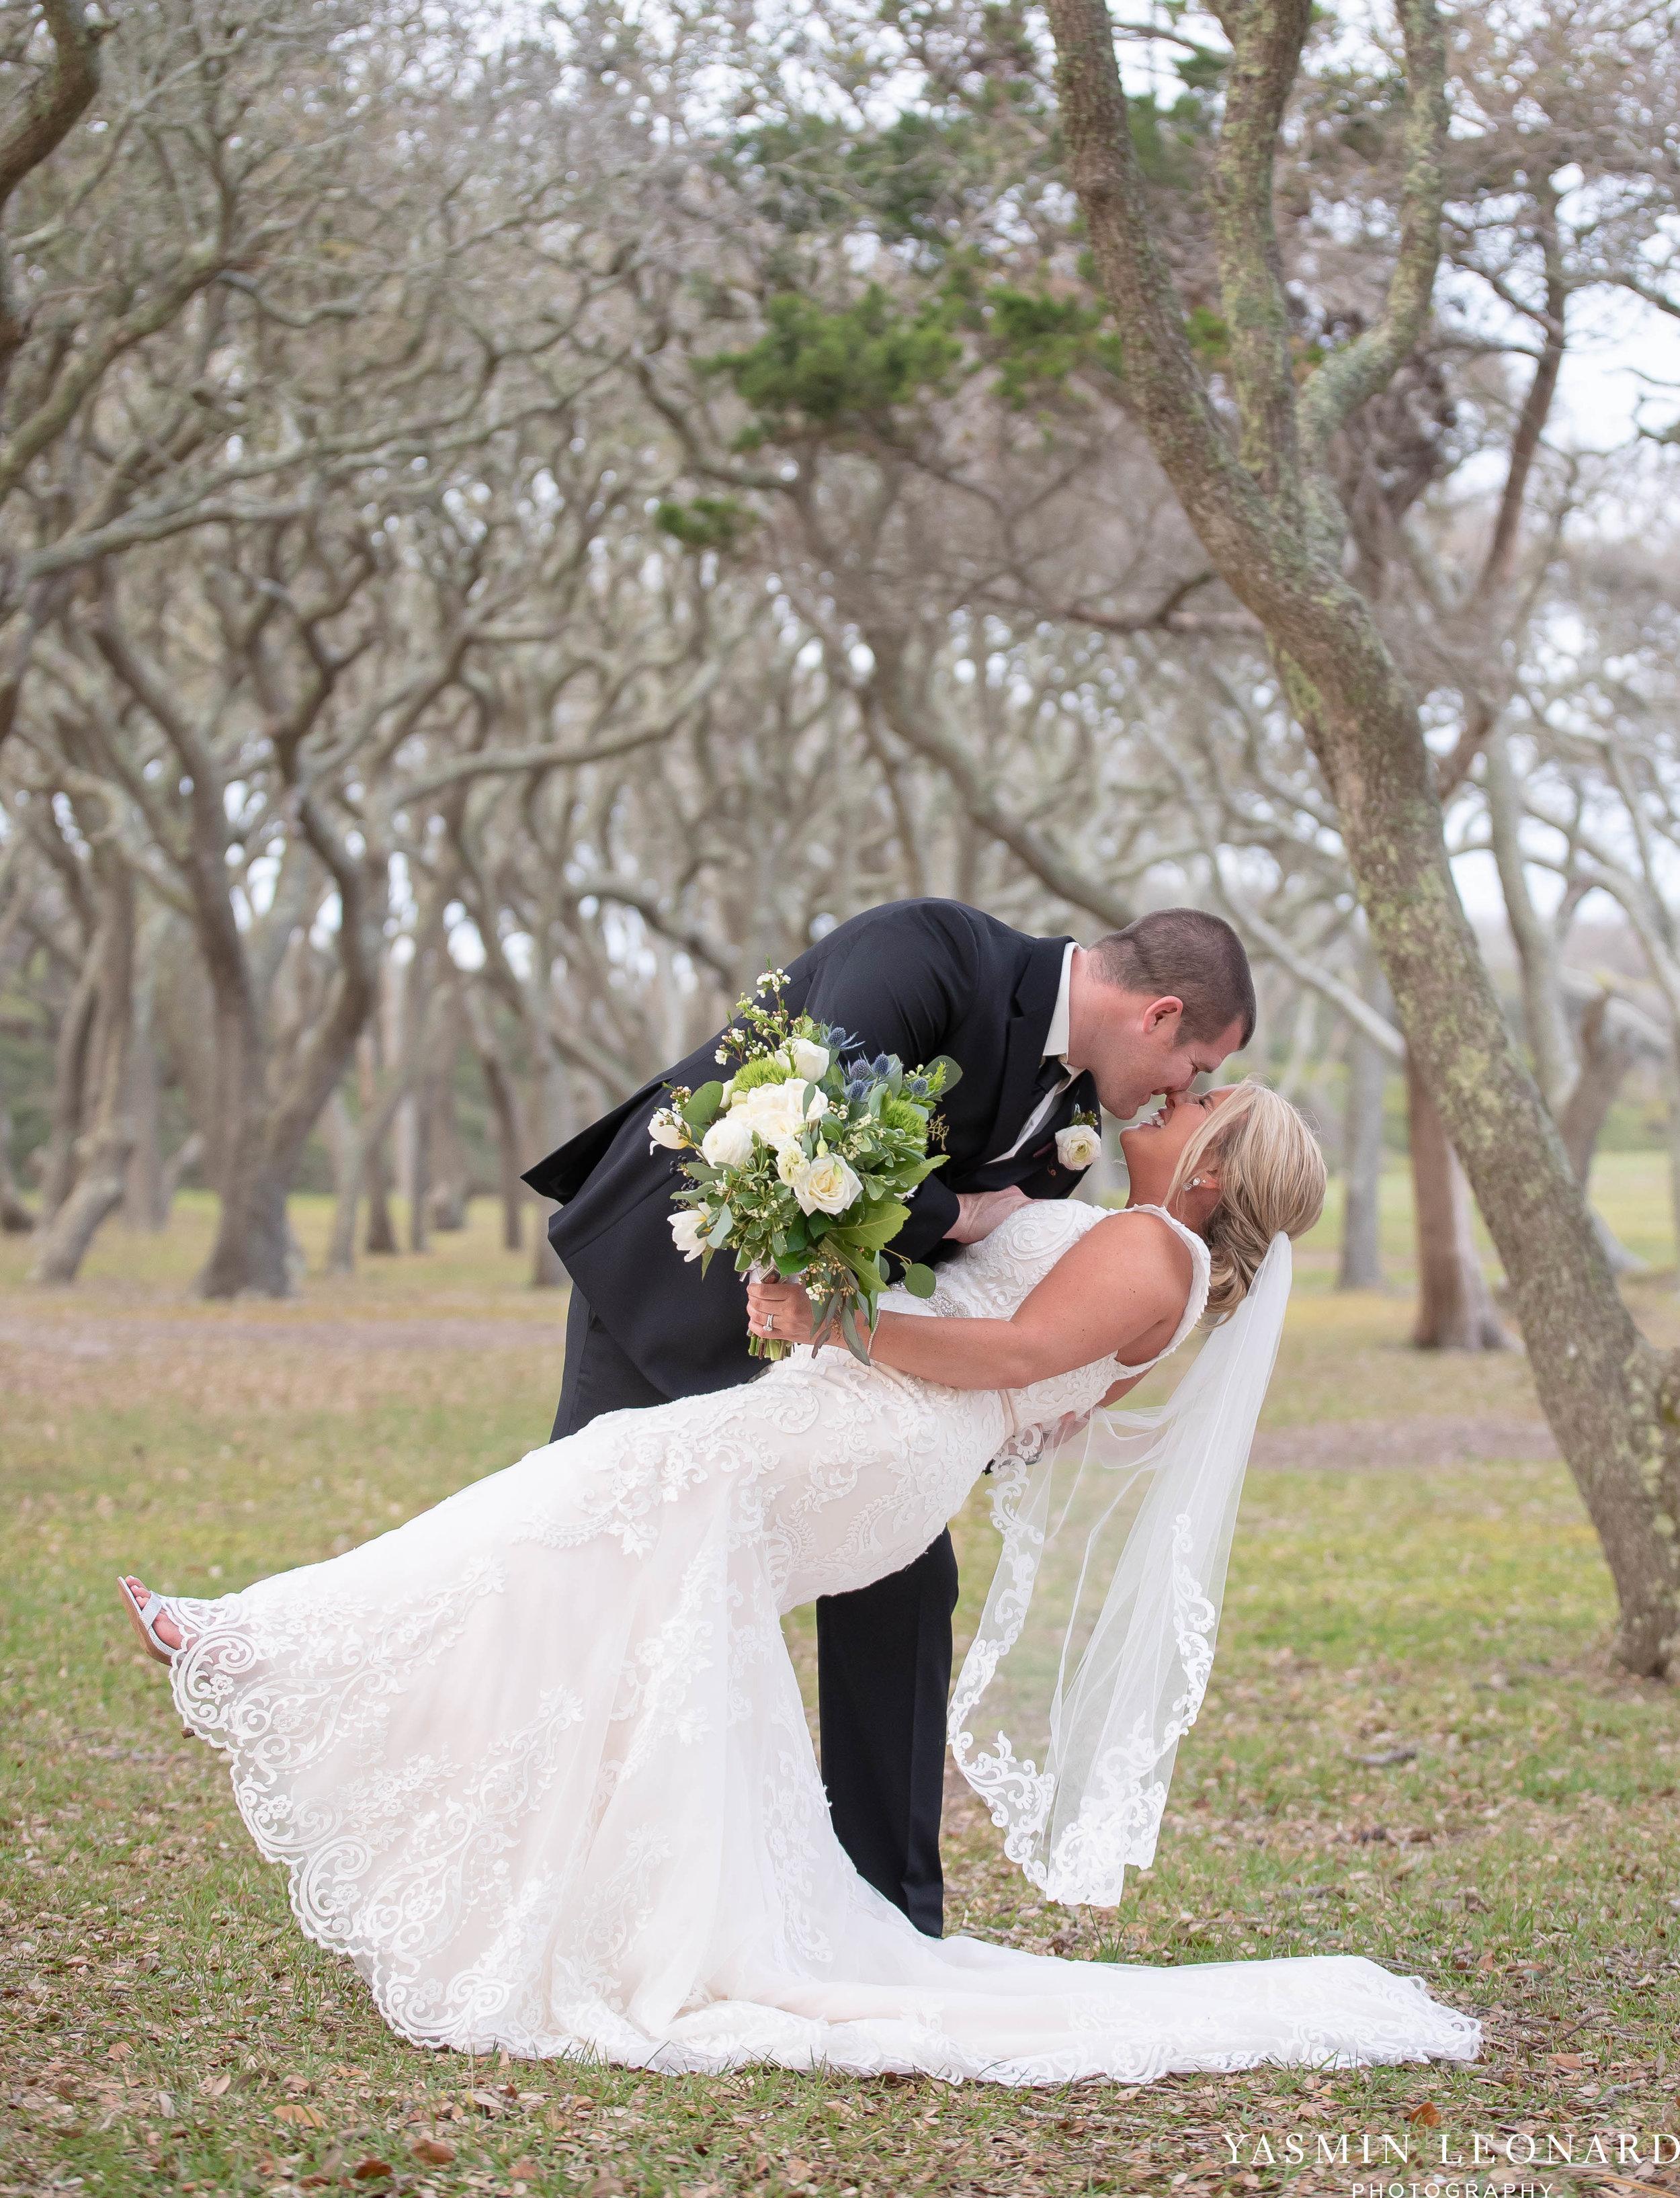 Carolina Beach Wedding - Fort Fisher Wedding - NC Acquarium - Beach Wedding - NC Wedding - Beach Wedding Inspiration - Beach Bride-36.jpg